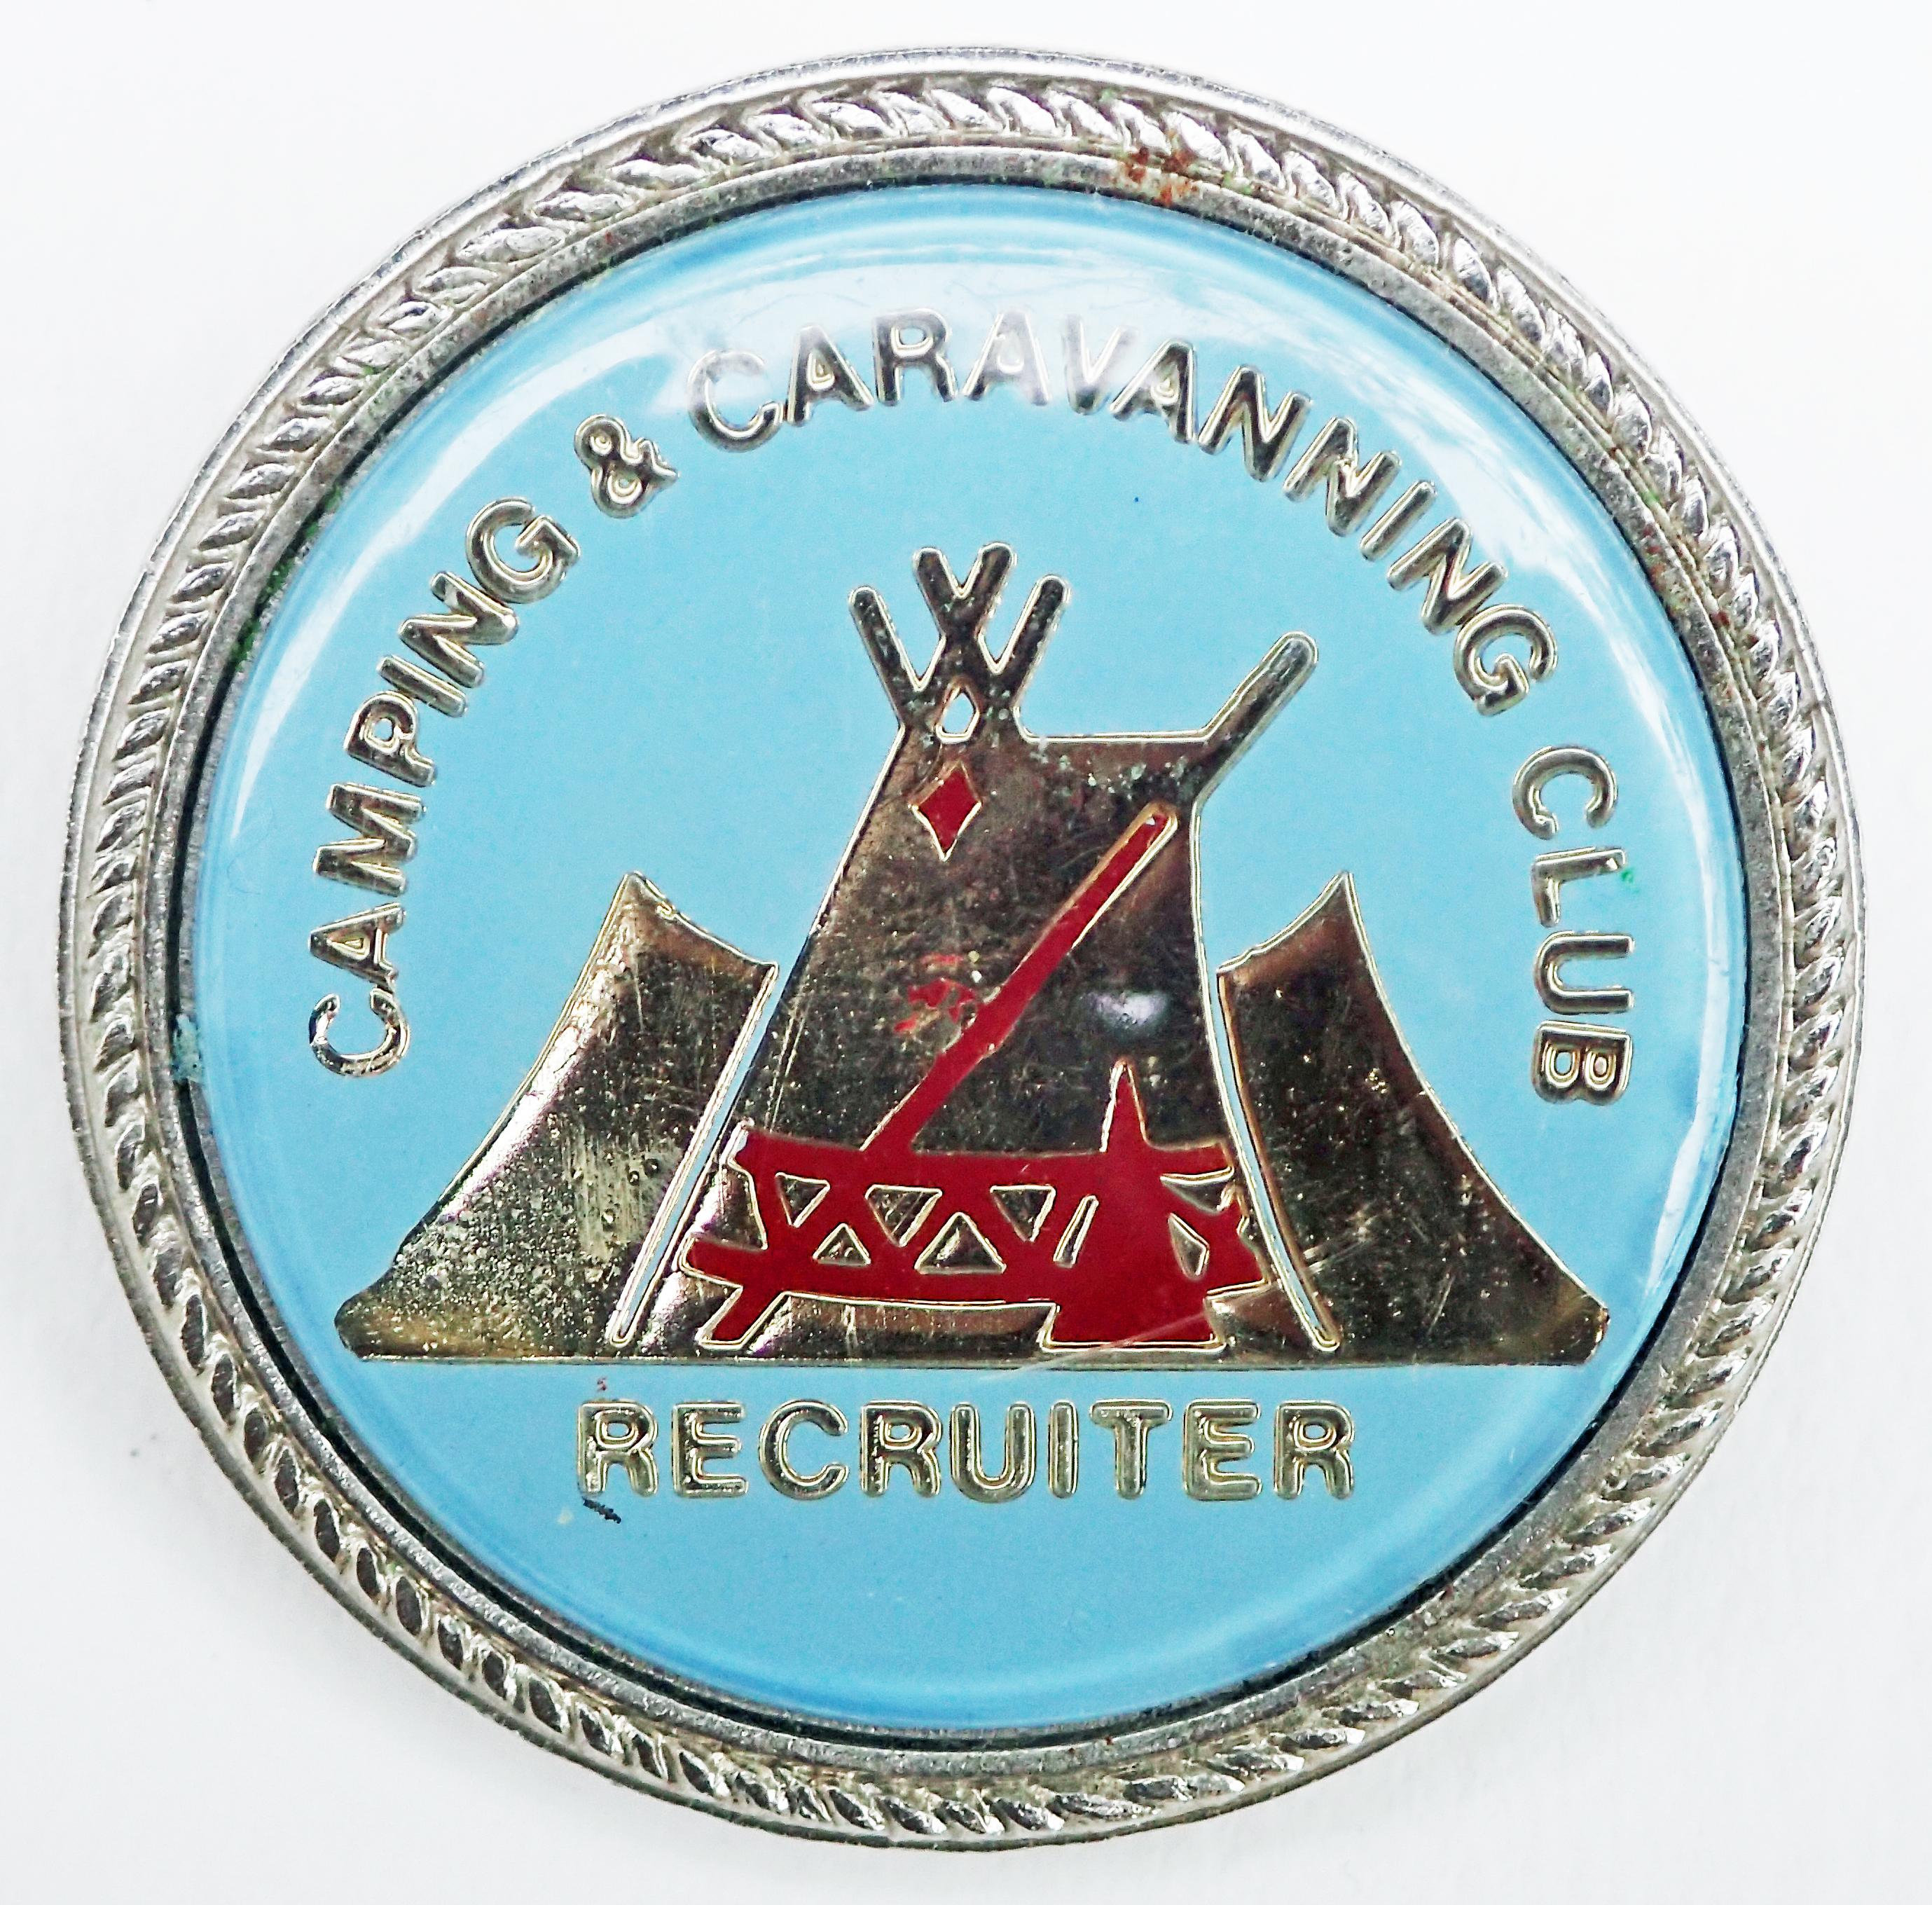 Recruiter badge. Patterned edge.  Pin back. 29.50mm. No maker's name